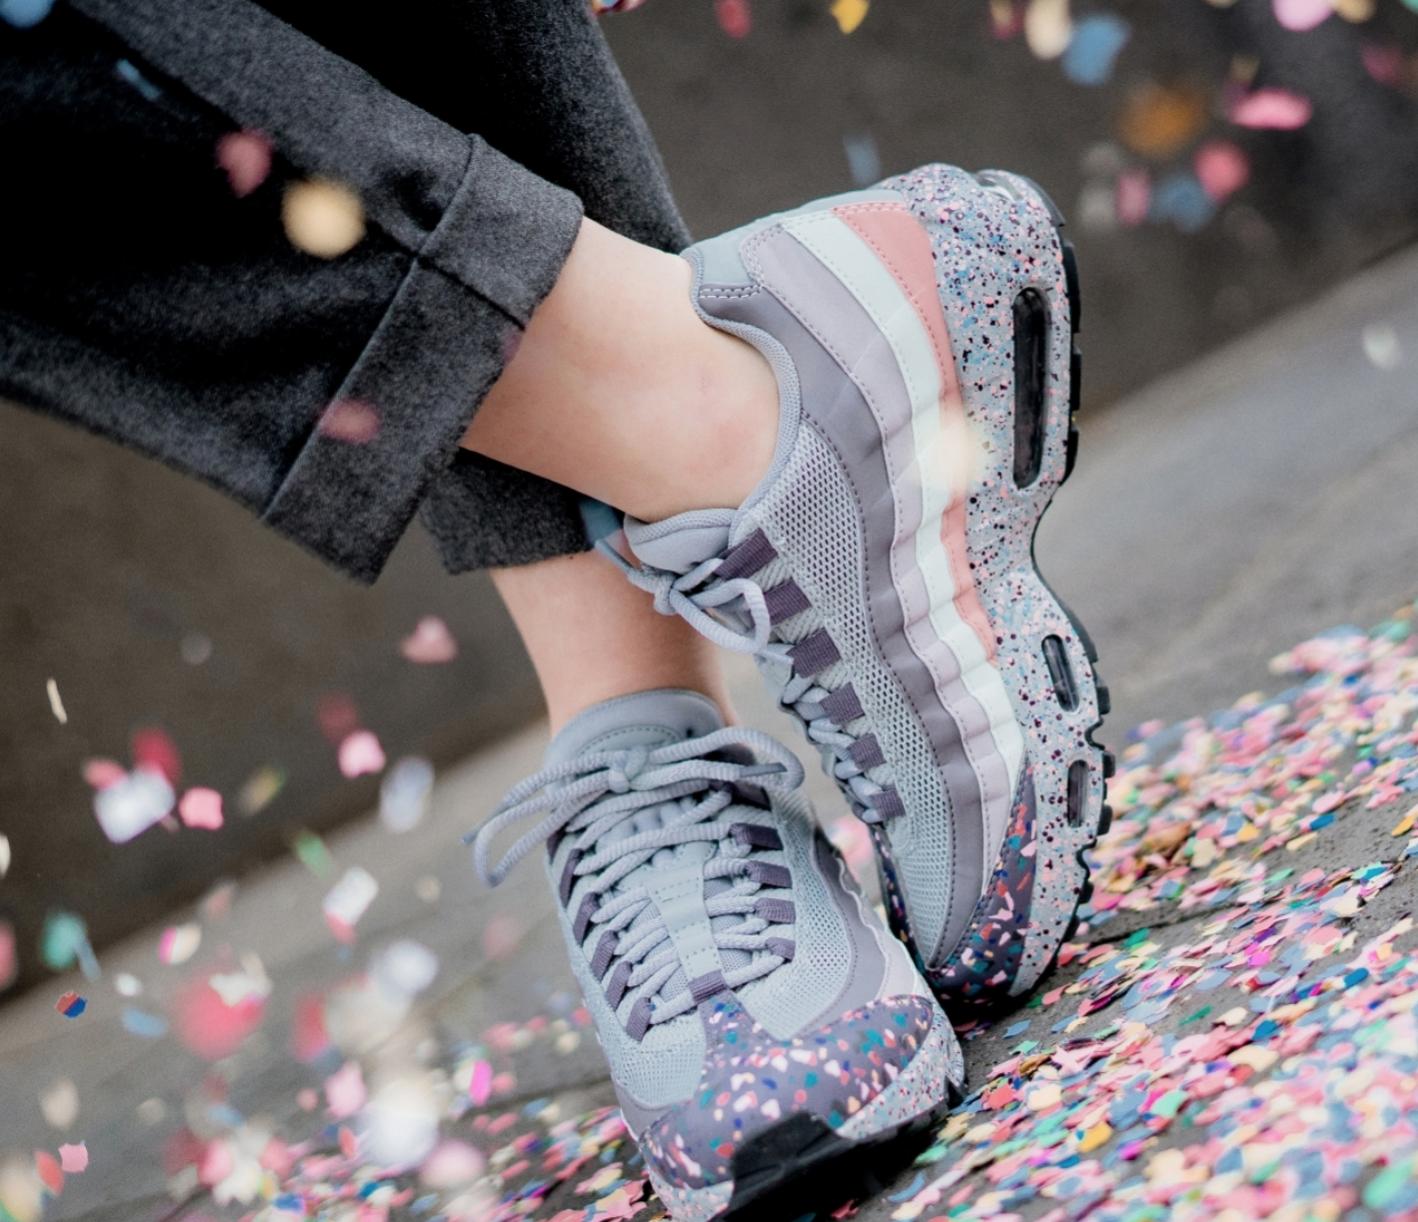 Nike AIR MAX 95  Confetti  Taglia EU 40 40 40 US 8.5 918413-002 d0c538